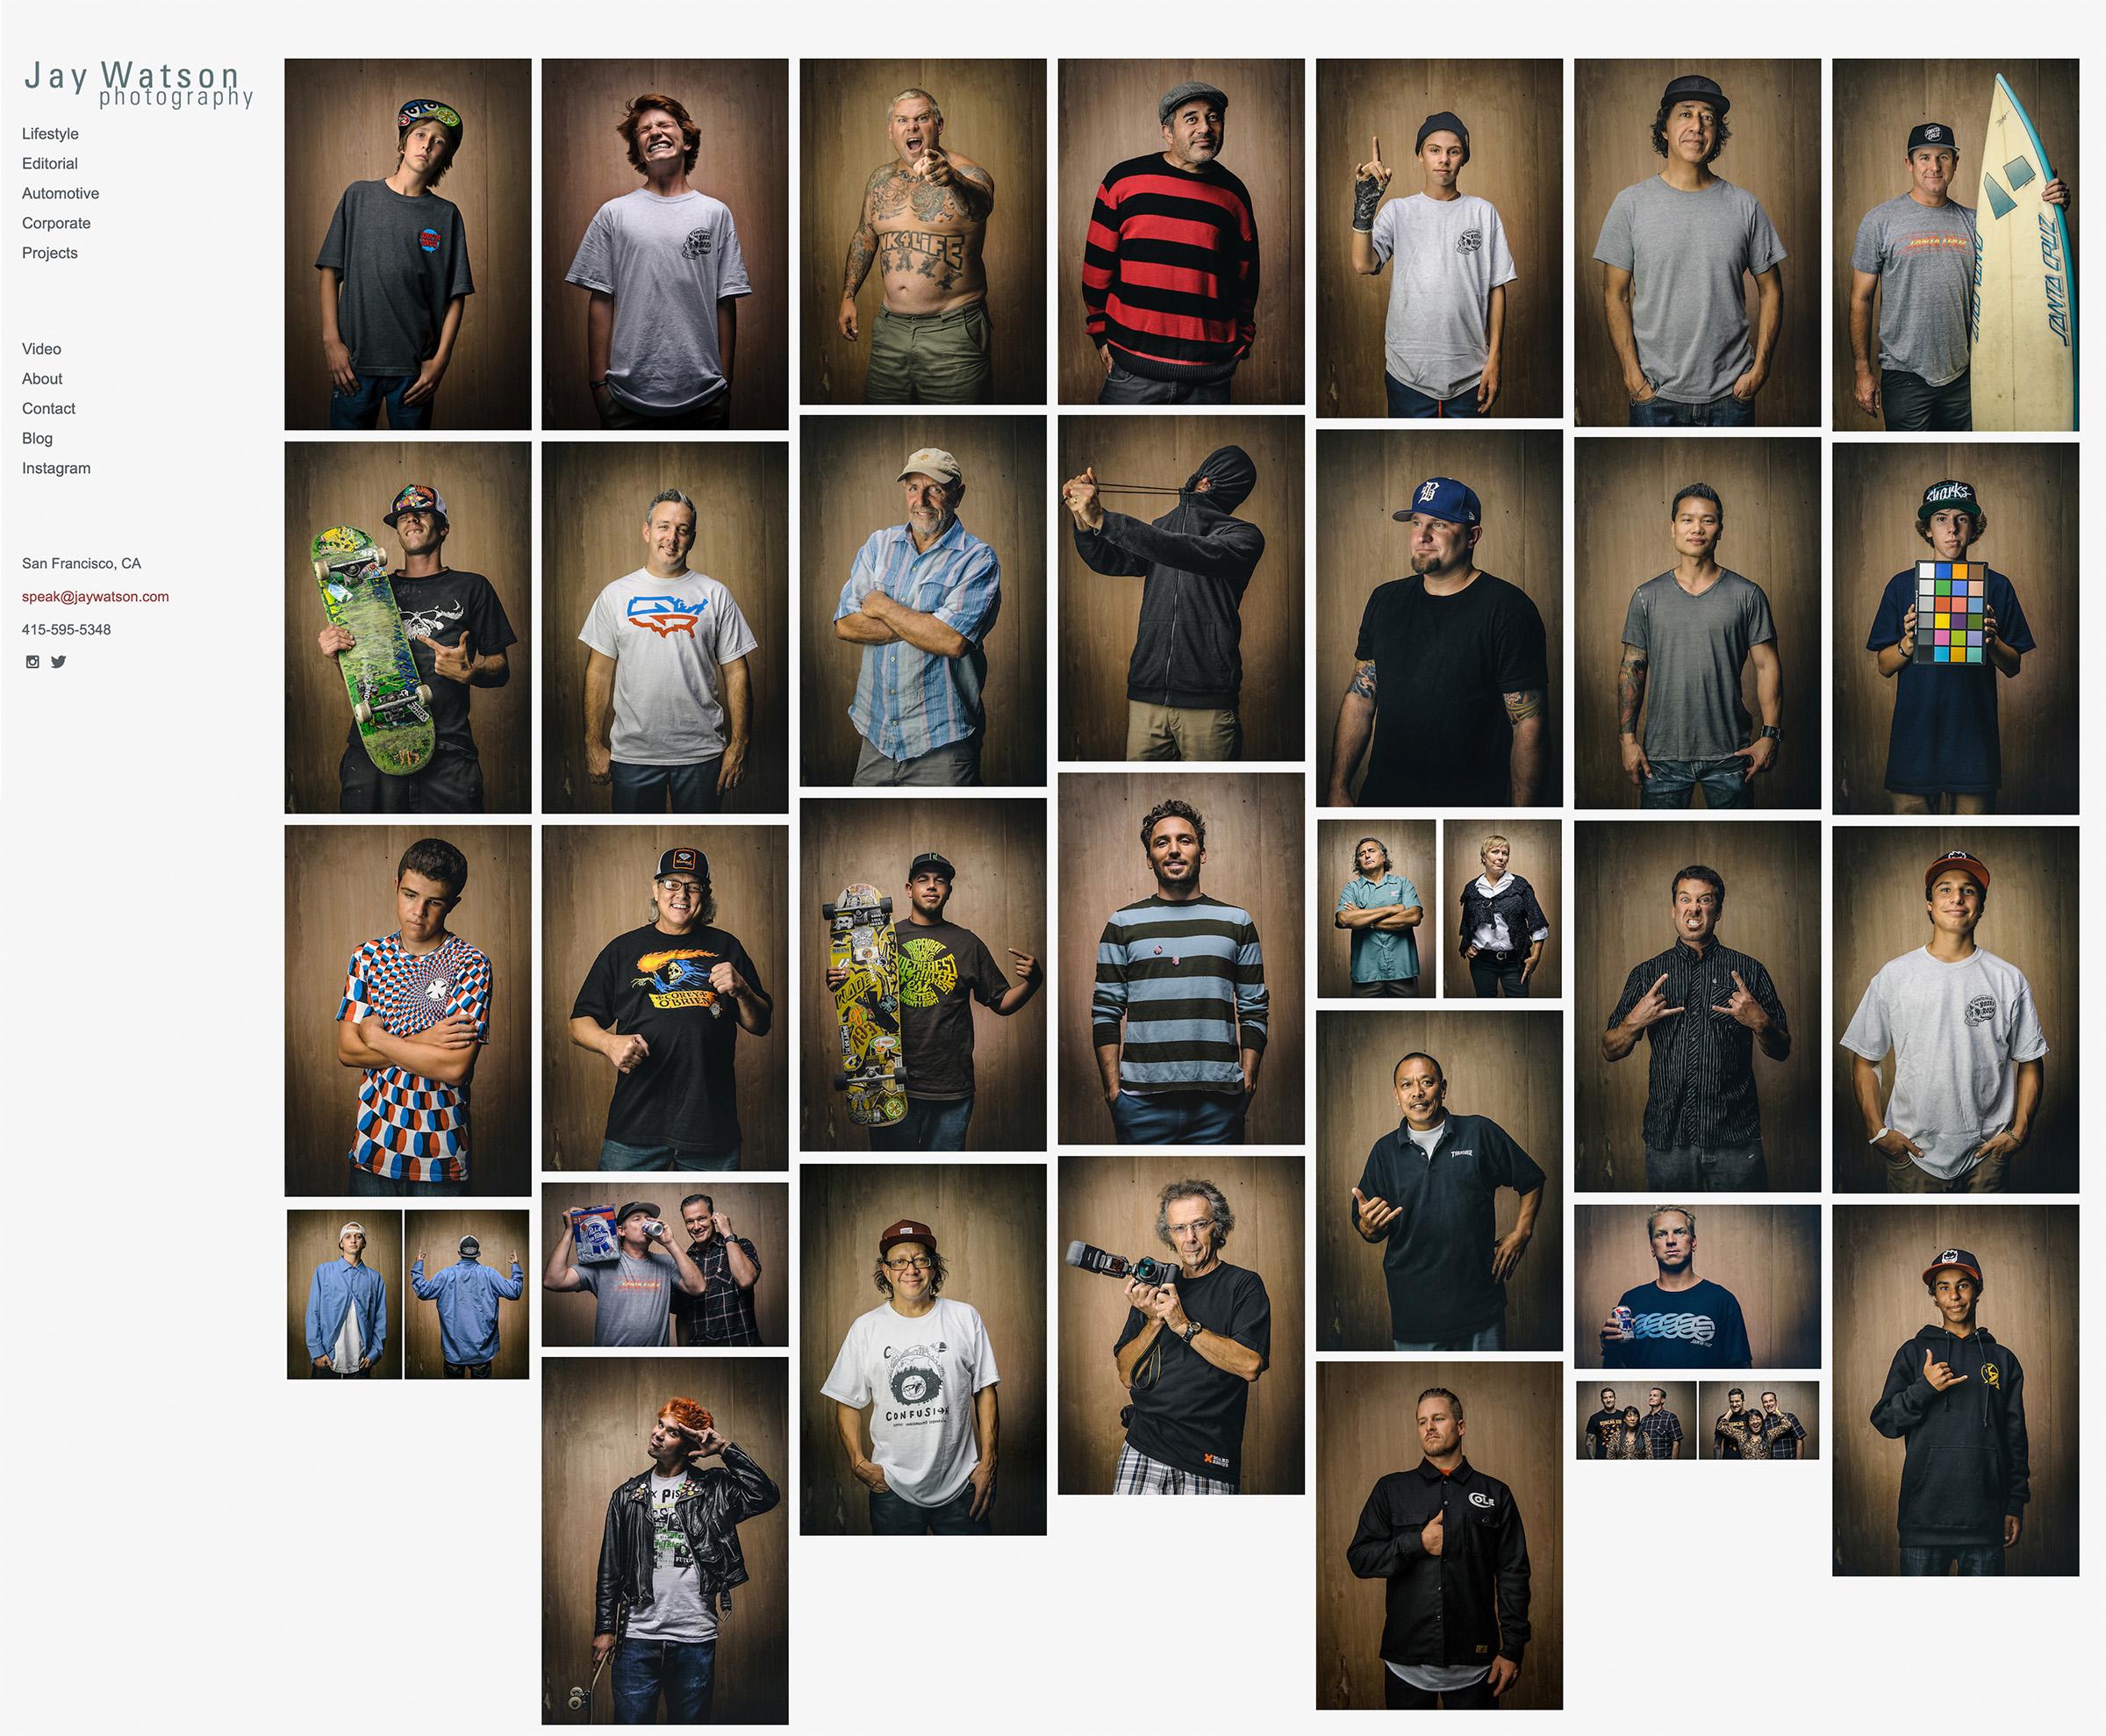 photo gallery of skateboarders in Santa Cruz, CA